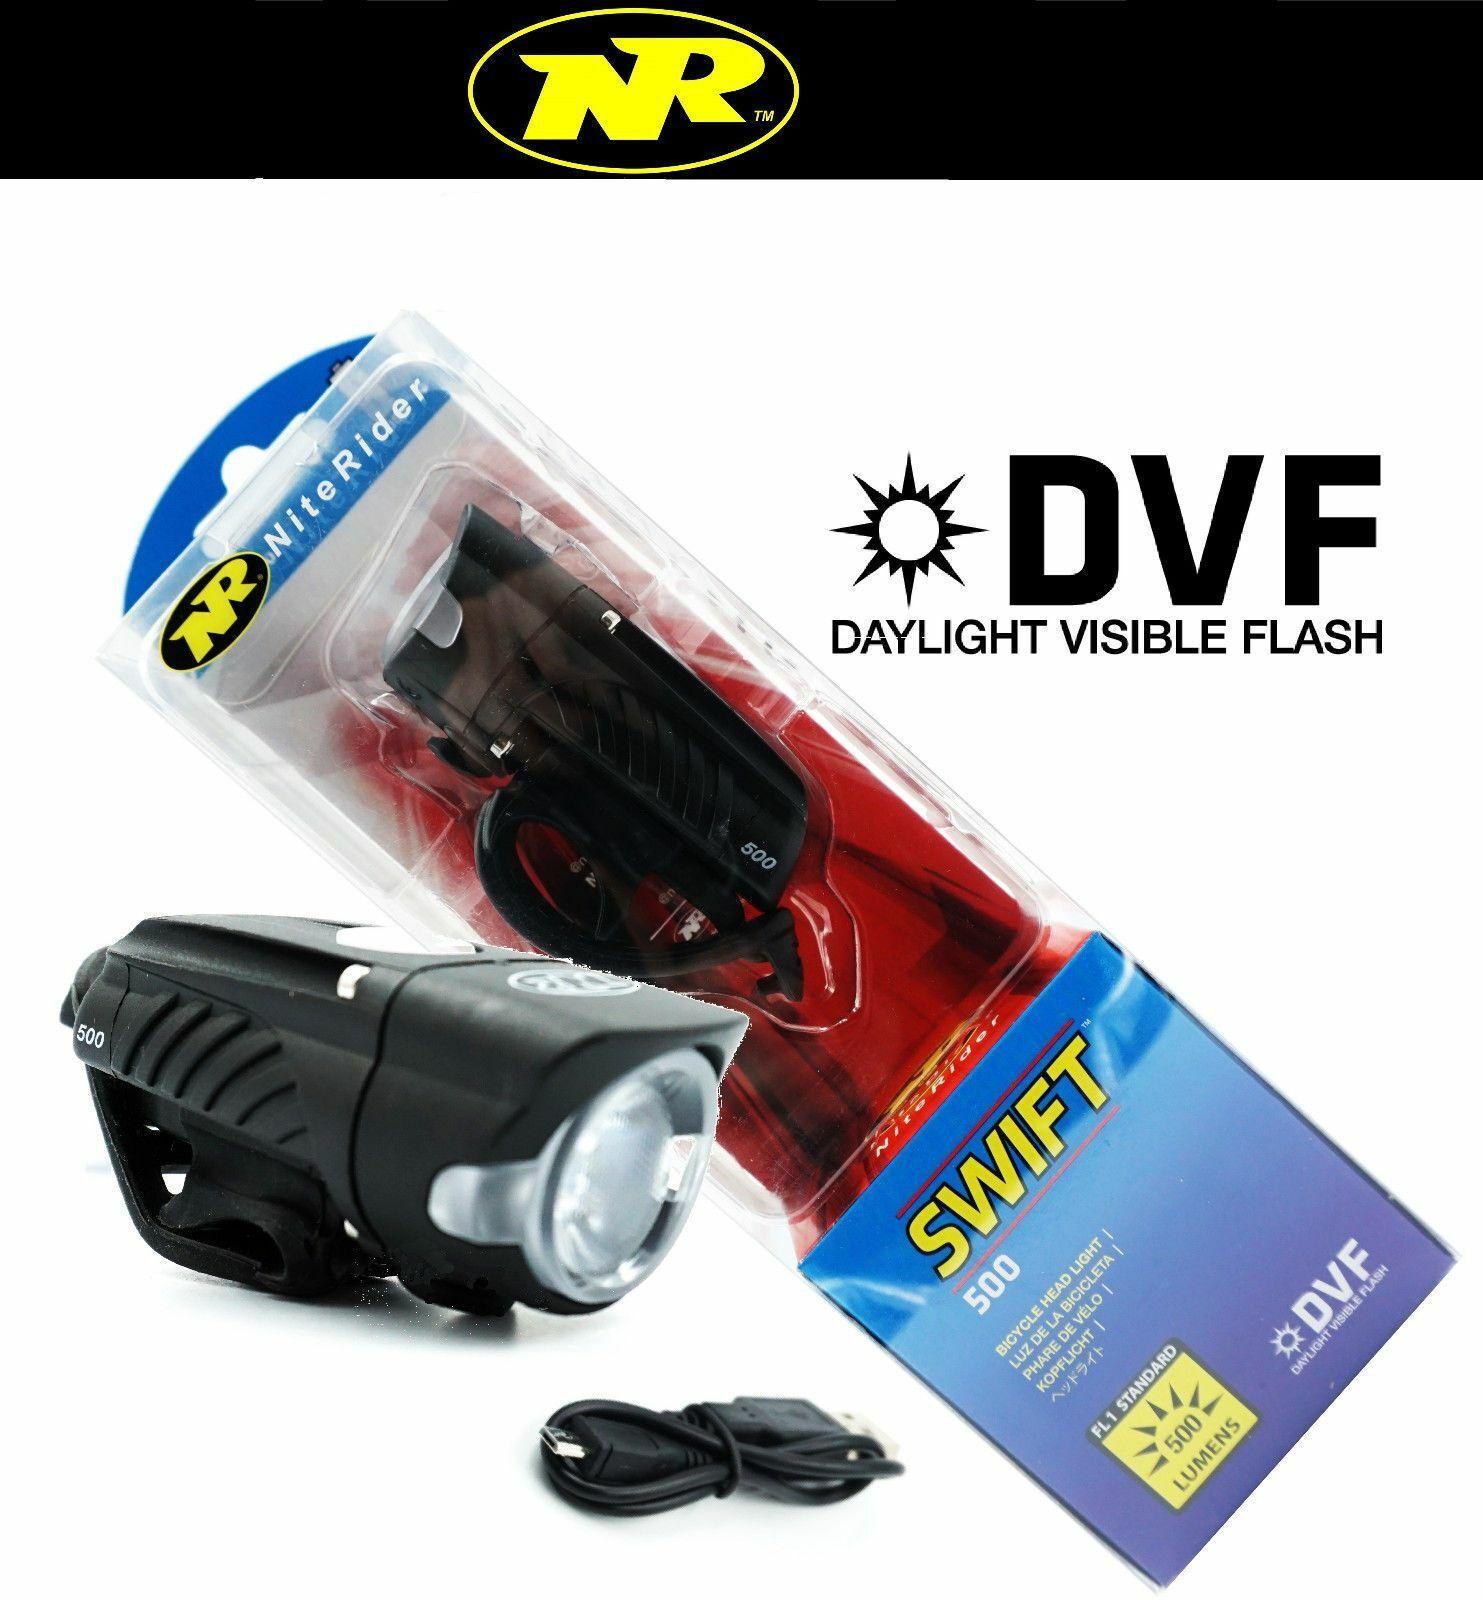 Niterider Swift 500 Lumens LED Bike Headlight Daylight Visible USB Rechargeable